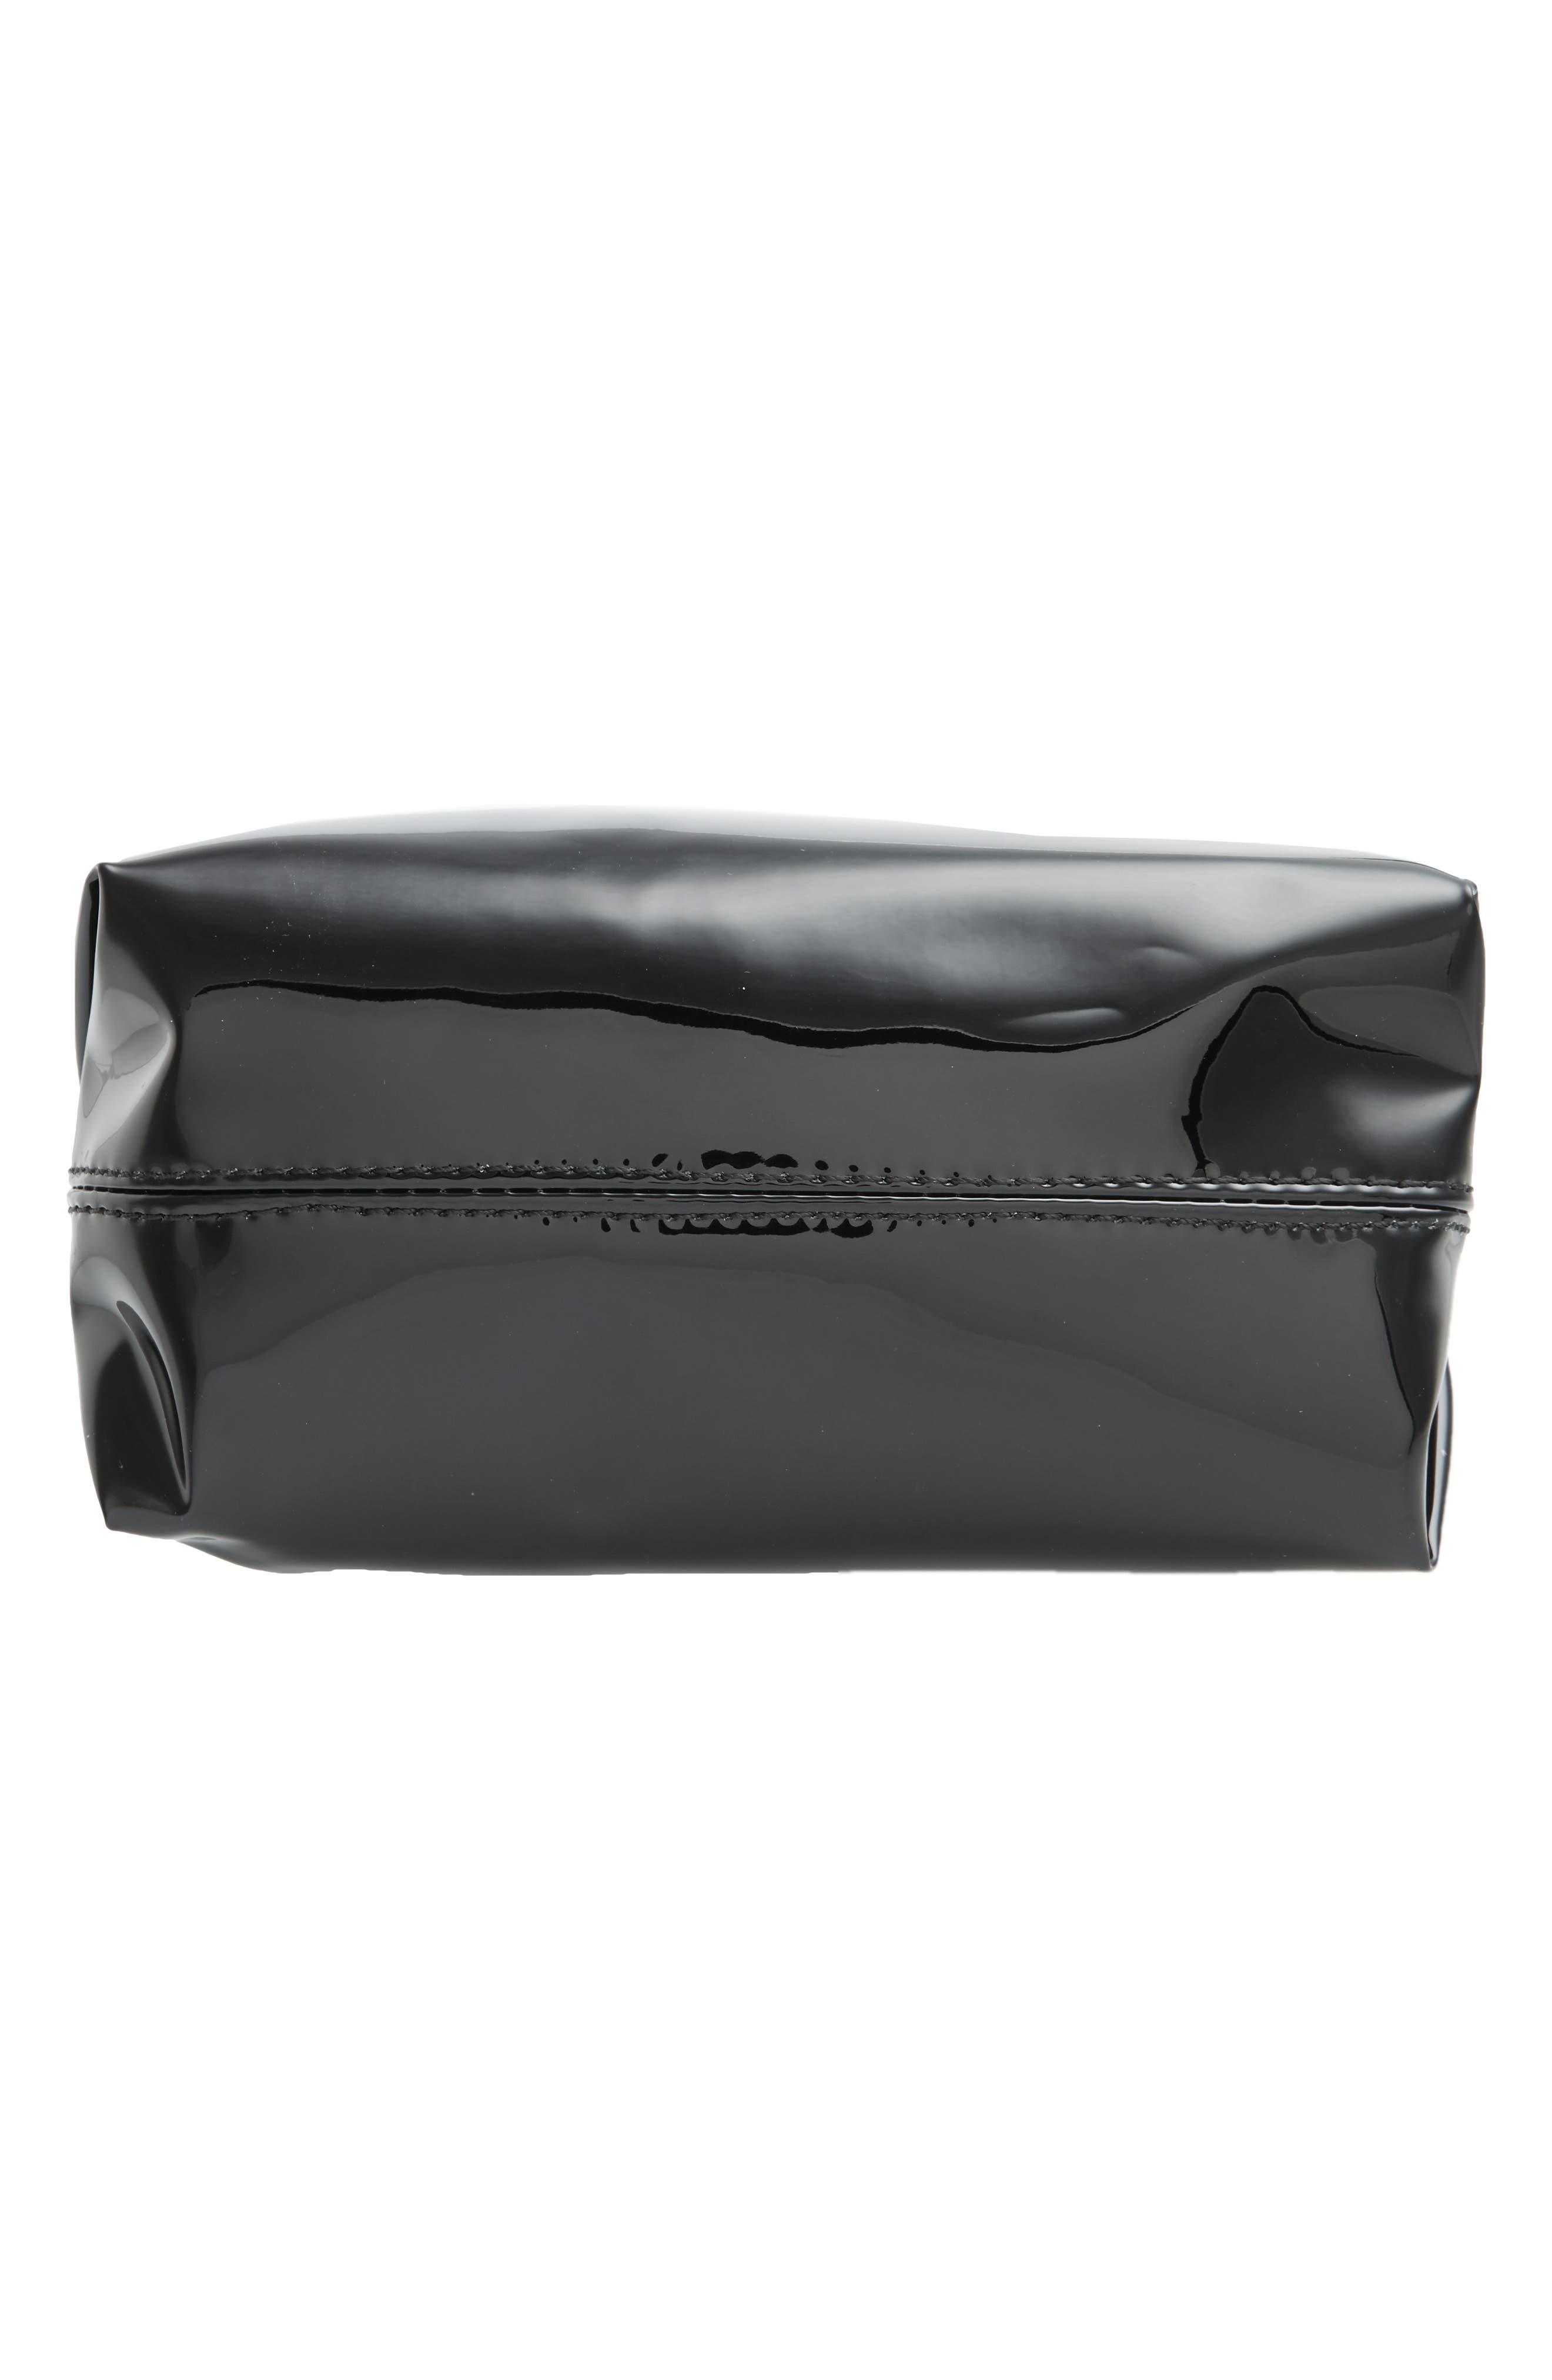 Metallic Cosmetics Bag,                             Alternate thumbnail 5, color,                             001